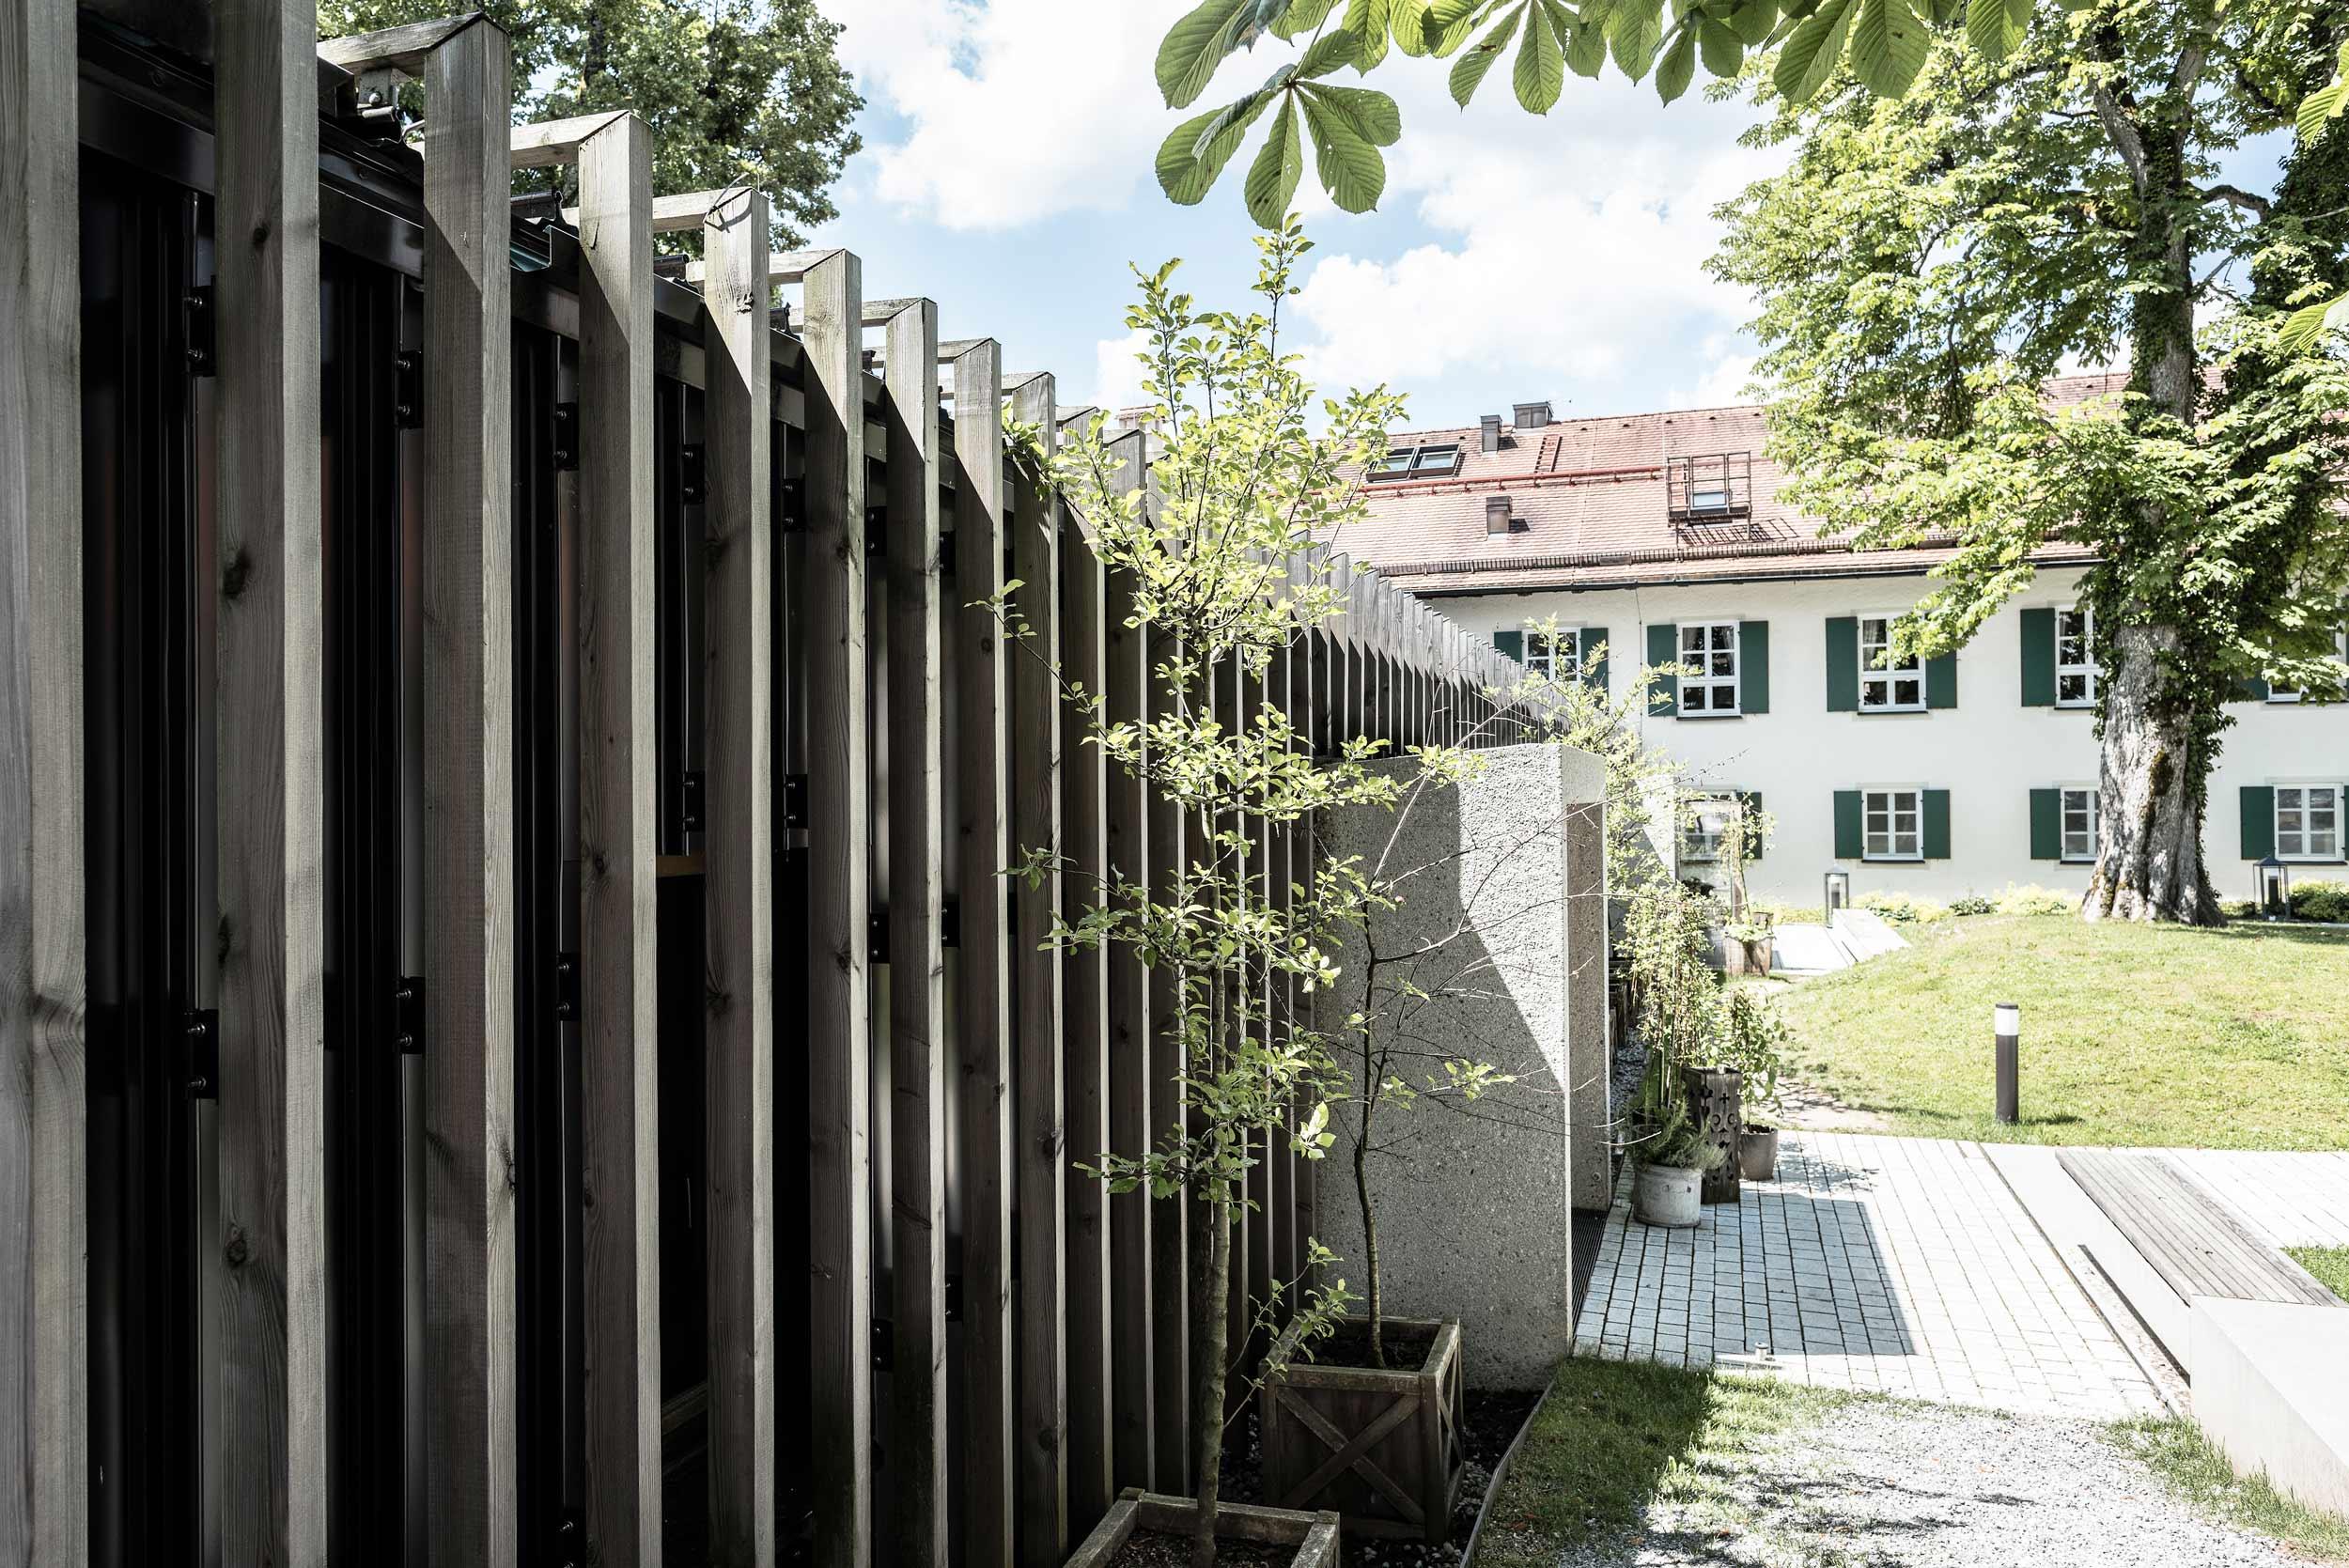 zimmerei-stoib-holzbau-holzhaus-gut-kaltenbrunn-tegernsee-festsaal-restaurant-fassade-sanierung-käfer-biergarten-terrasse-12.jpg